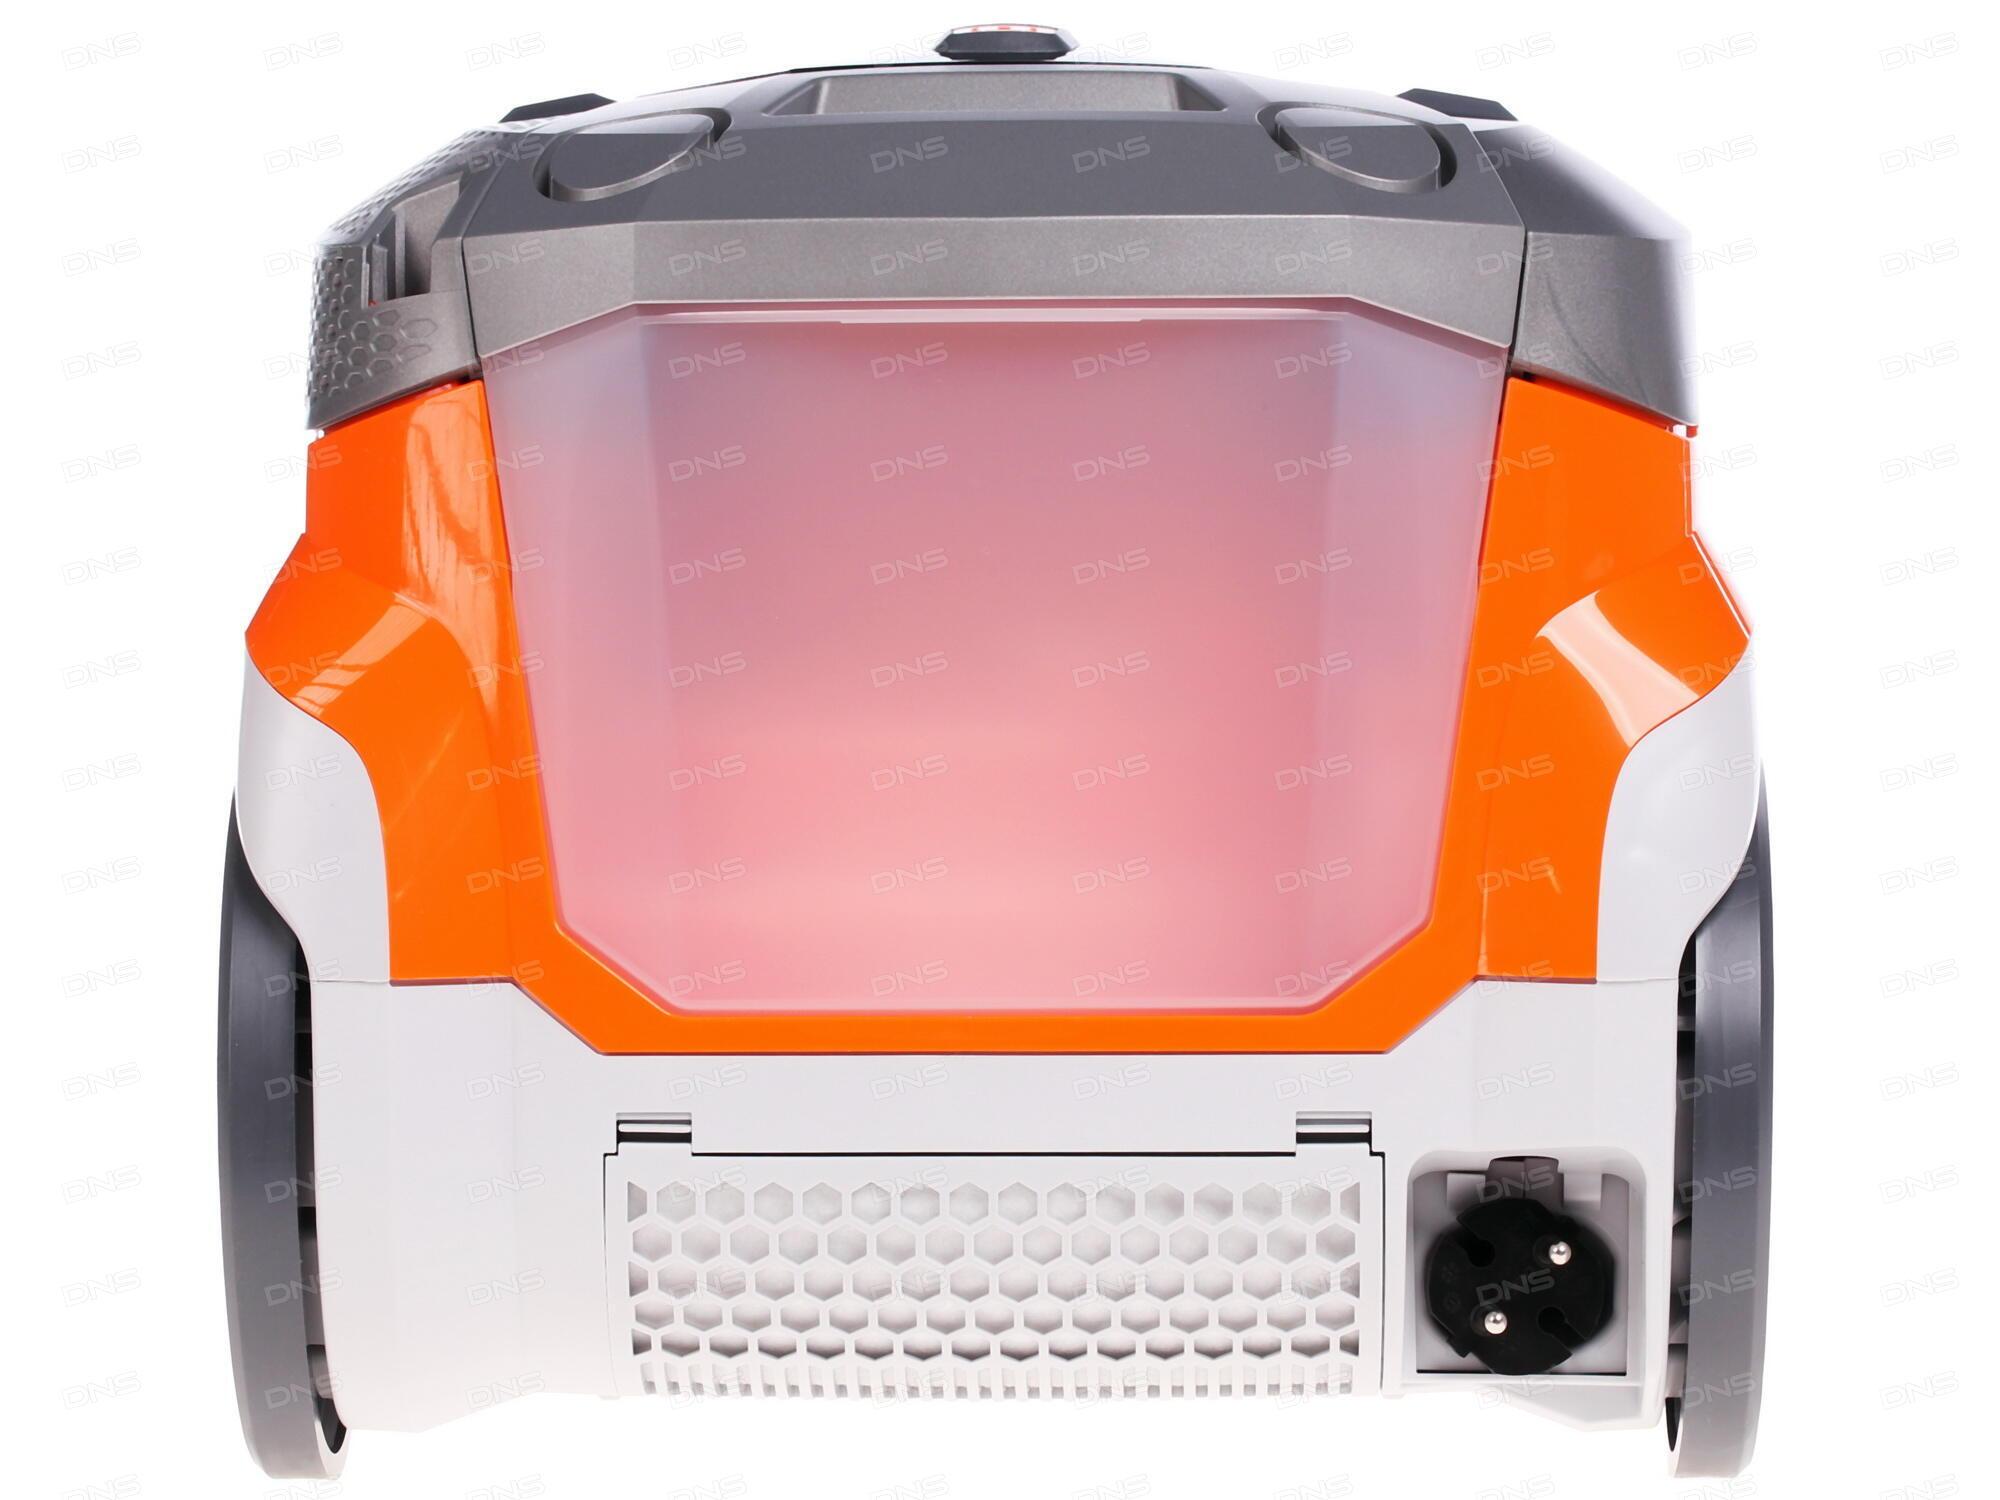 The THOMAS vacuum cleaner for animal hair - AQUA+ PET & FAMILY